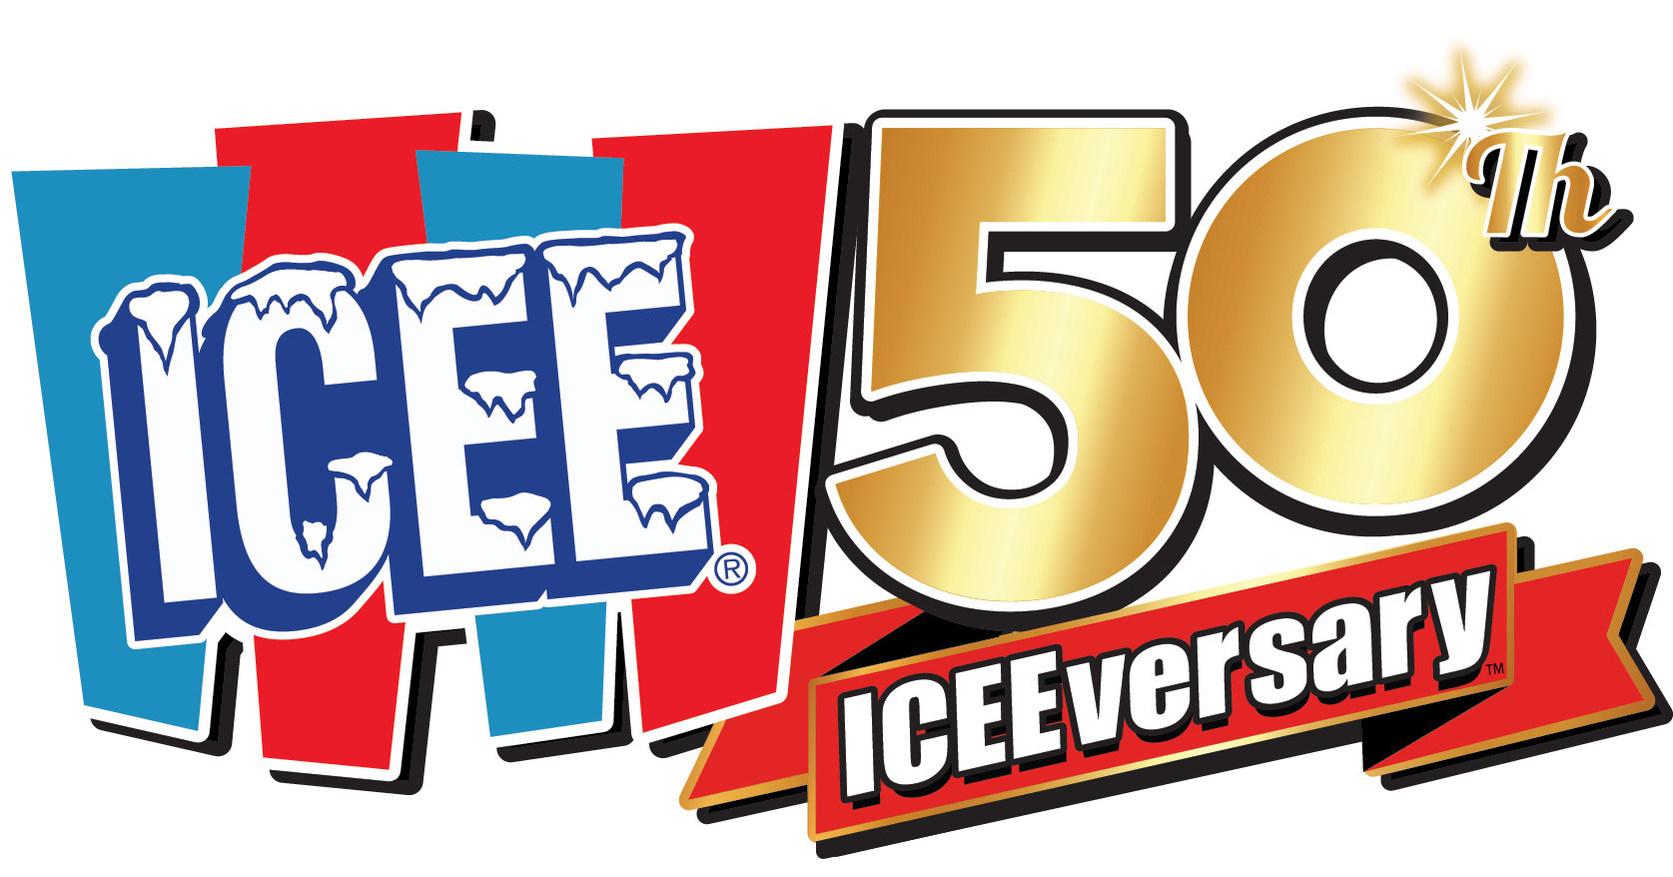 ICEE® Celebrates 50 Years as America's